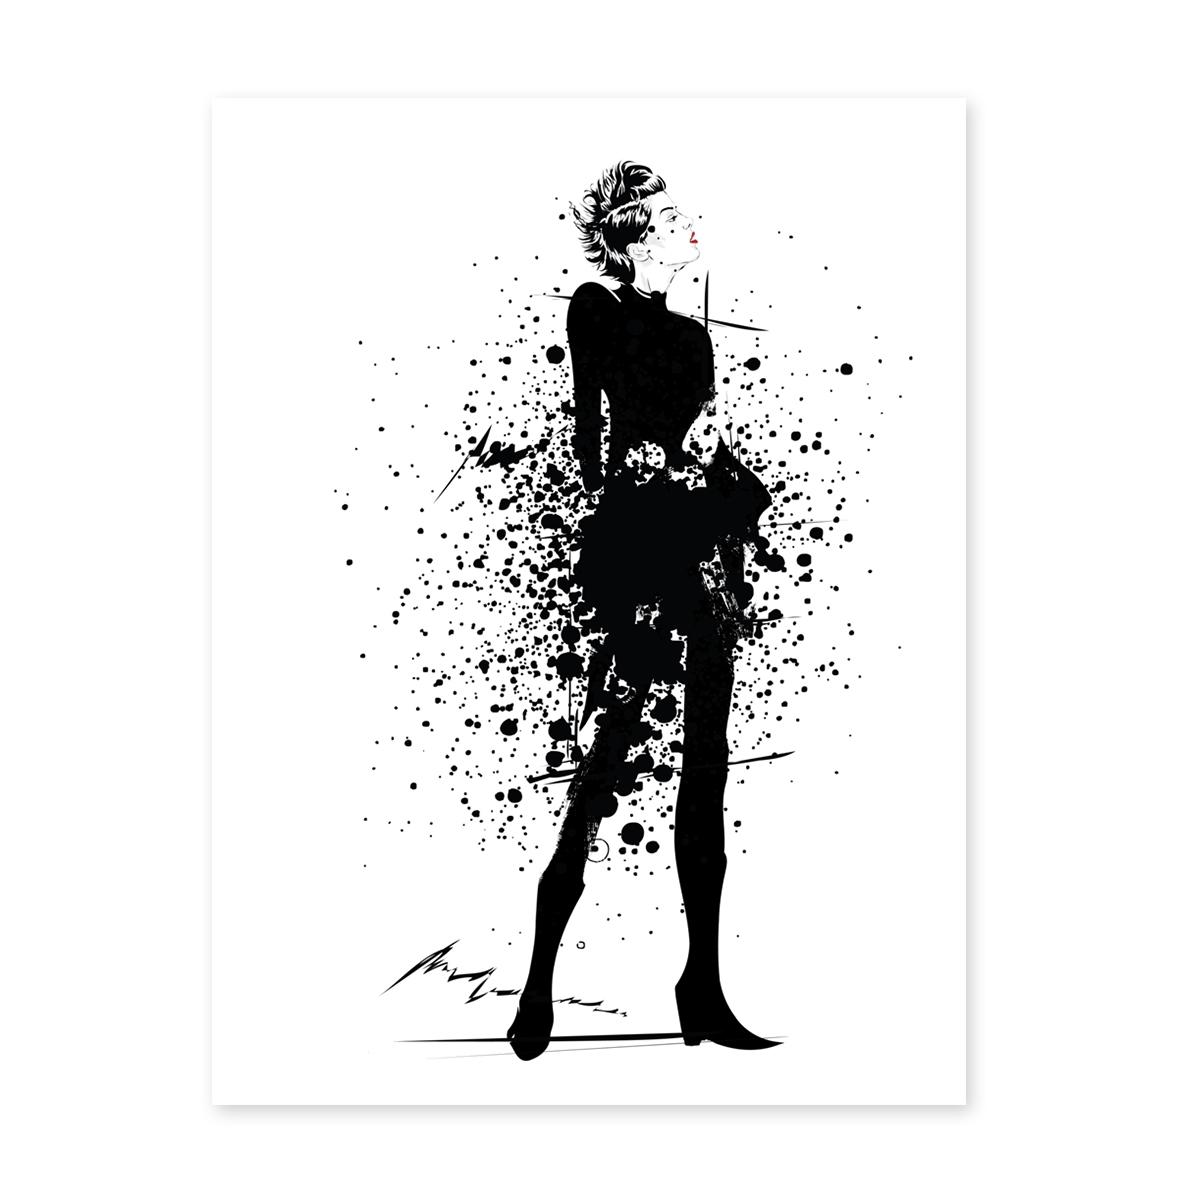 Design Poster Fashion 30x40 Cm Schwarz Weiss Frau Splash Look